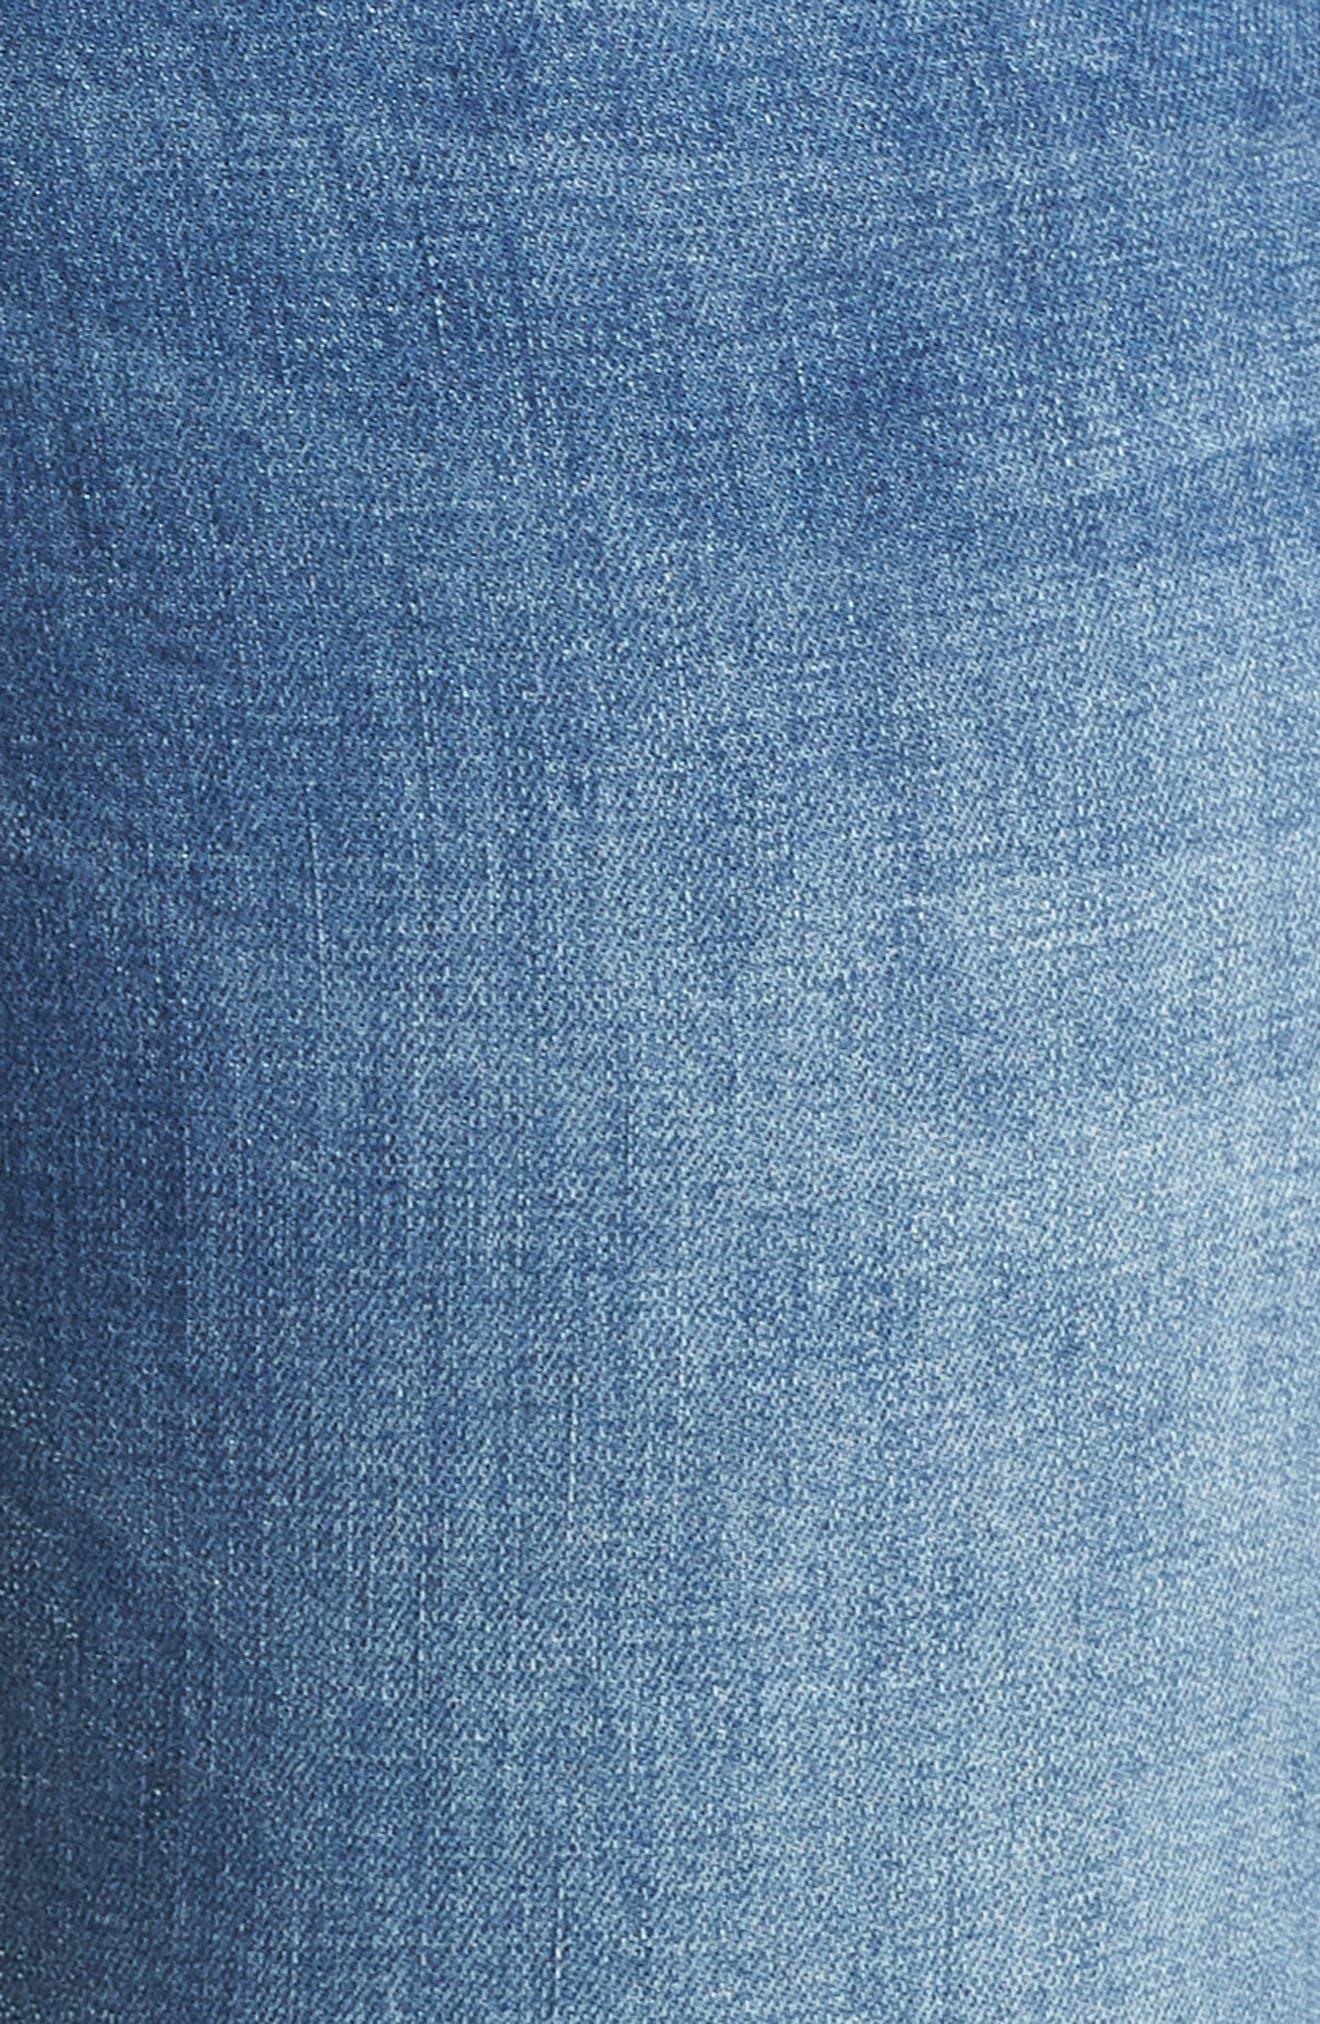 Rocker Skinny Jeans,                             Alternate thumbnail 6, color,                             LADYBIRD